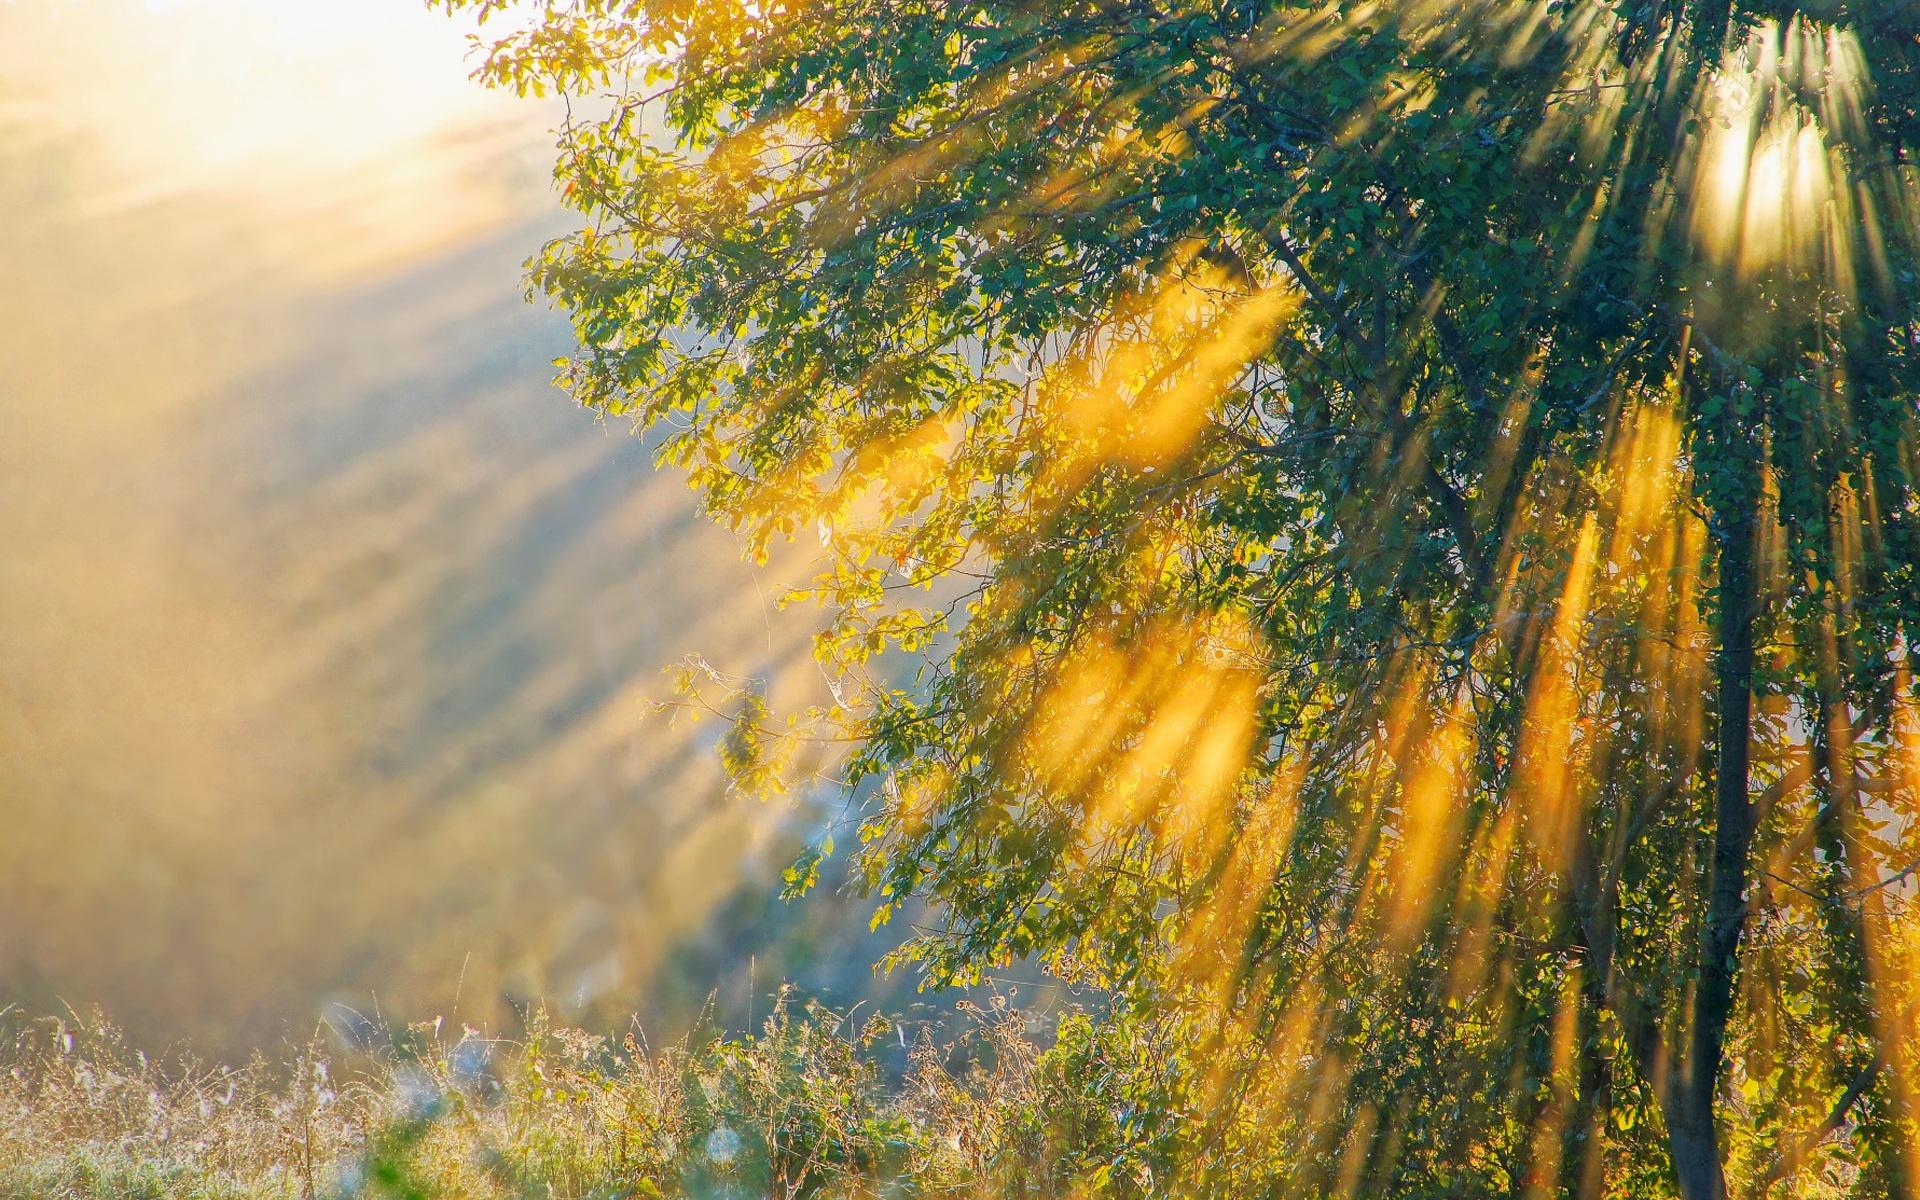 Nature Sunshine Galaxy S4 Wallpapers: 배경 화면 아침, 자연, 나무 햇살 1920x1200 HD 그림, 이미지